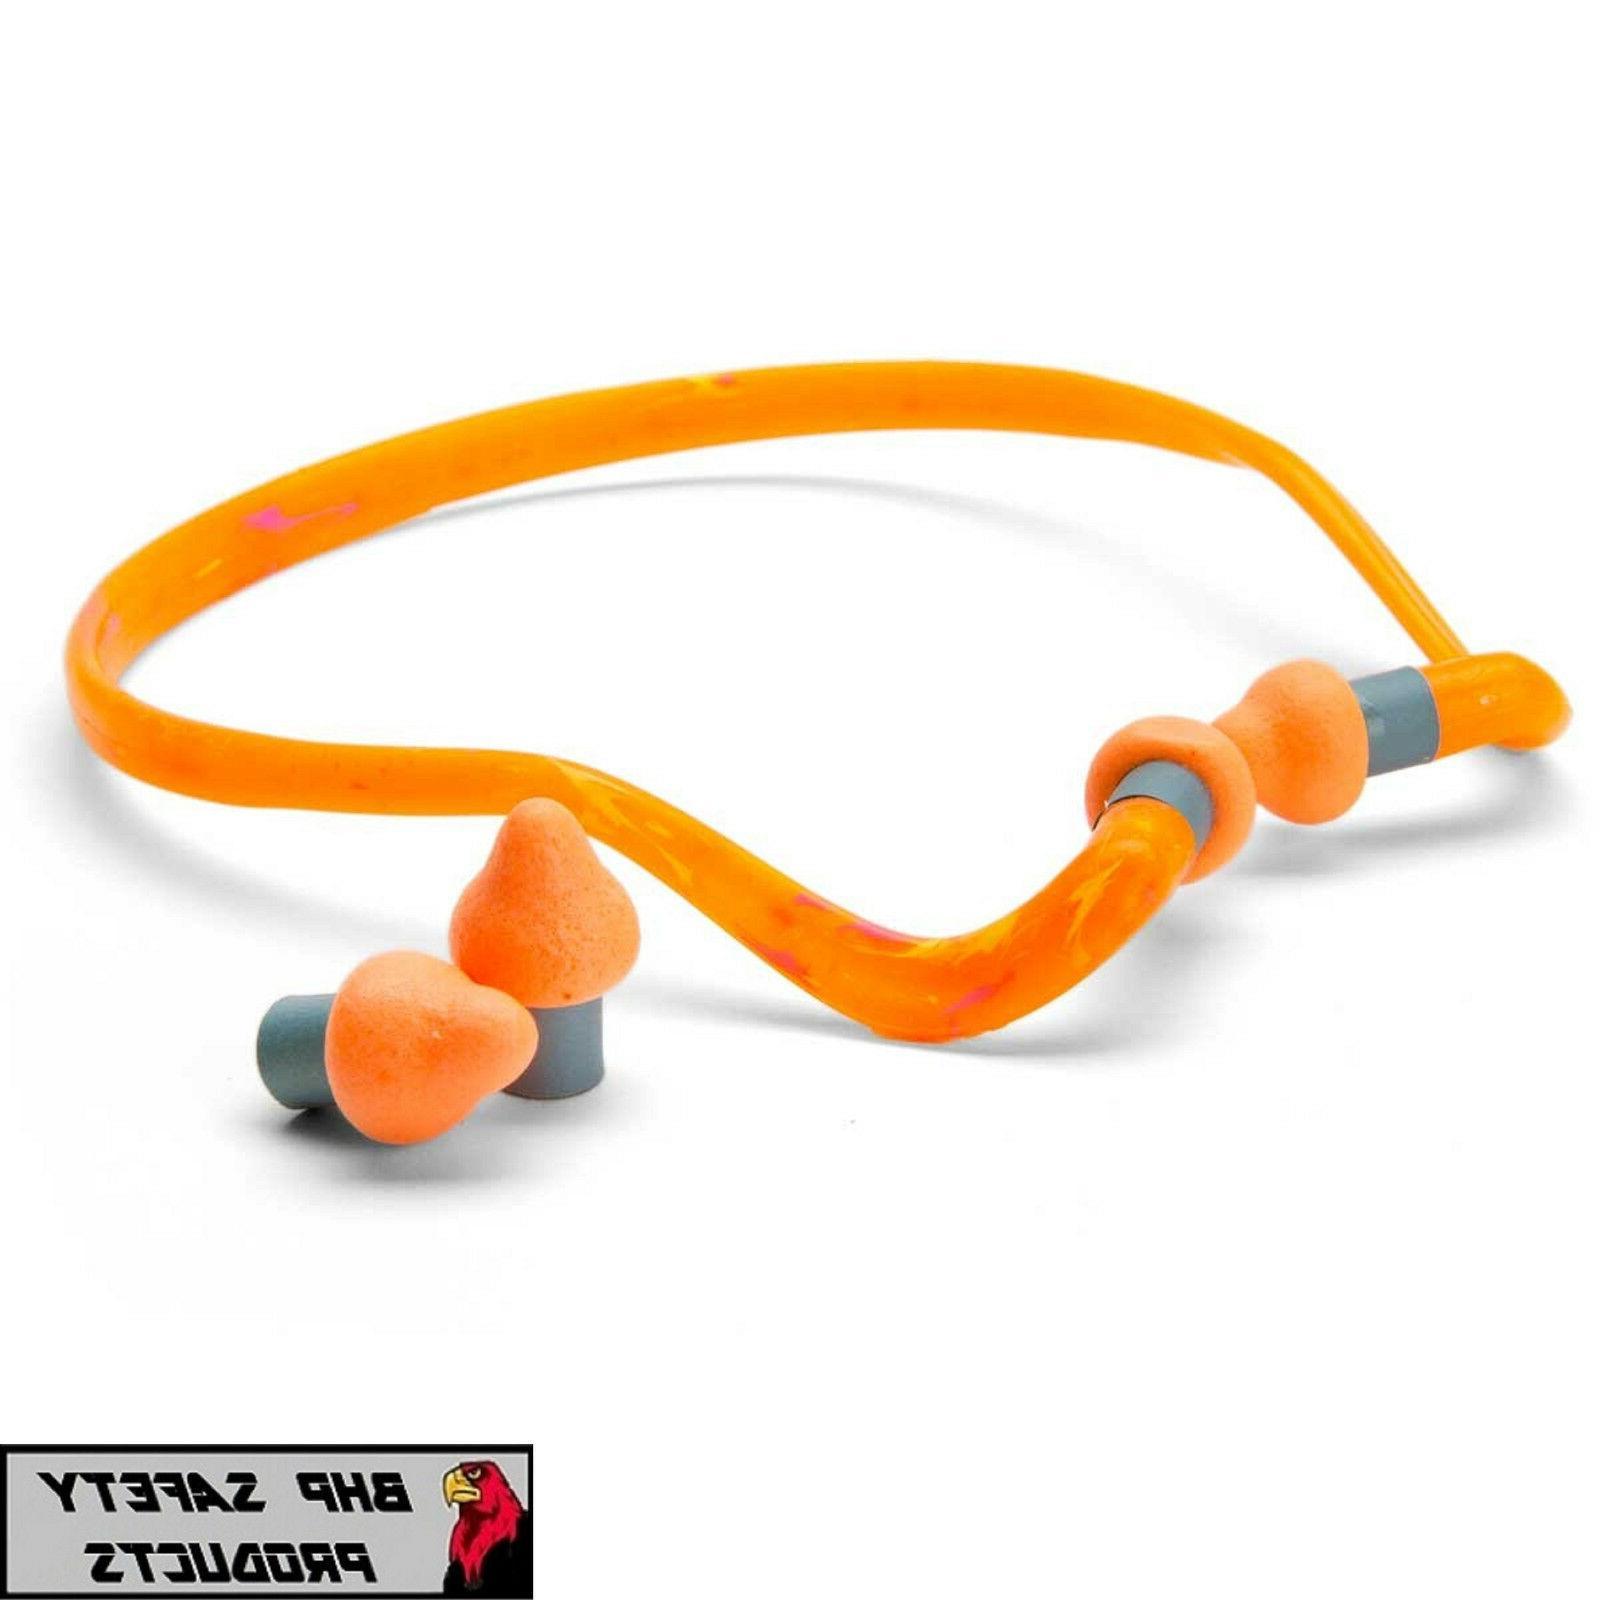 qb1hyg quiet bands ergonomic yellow